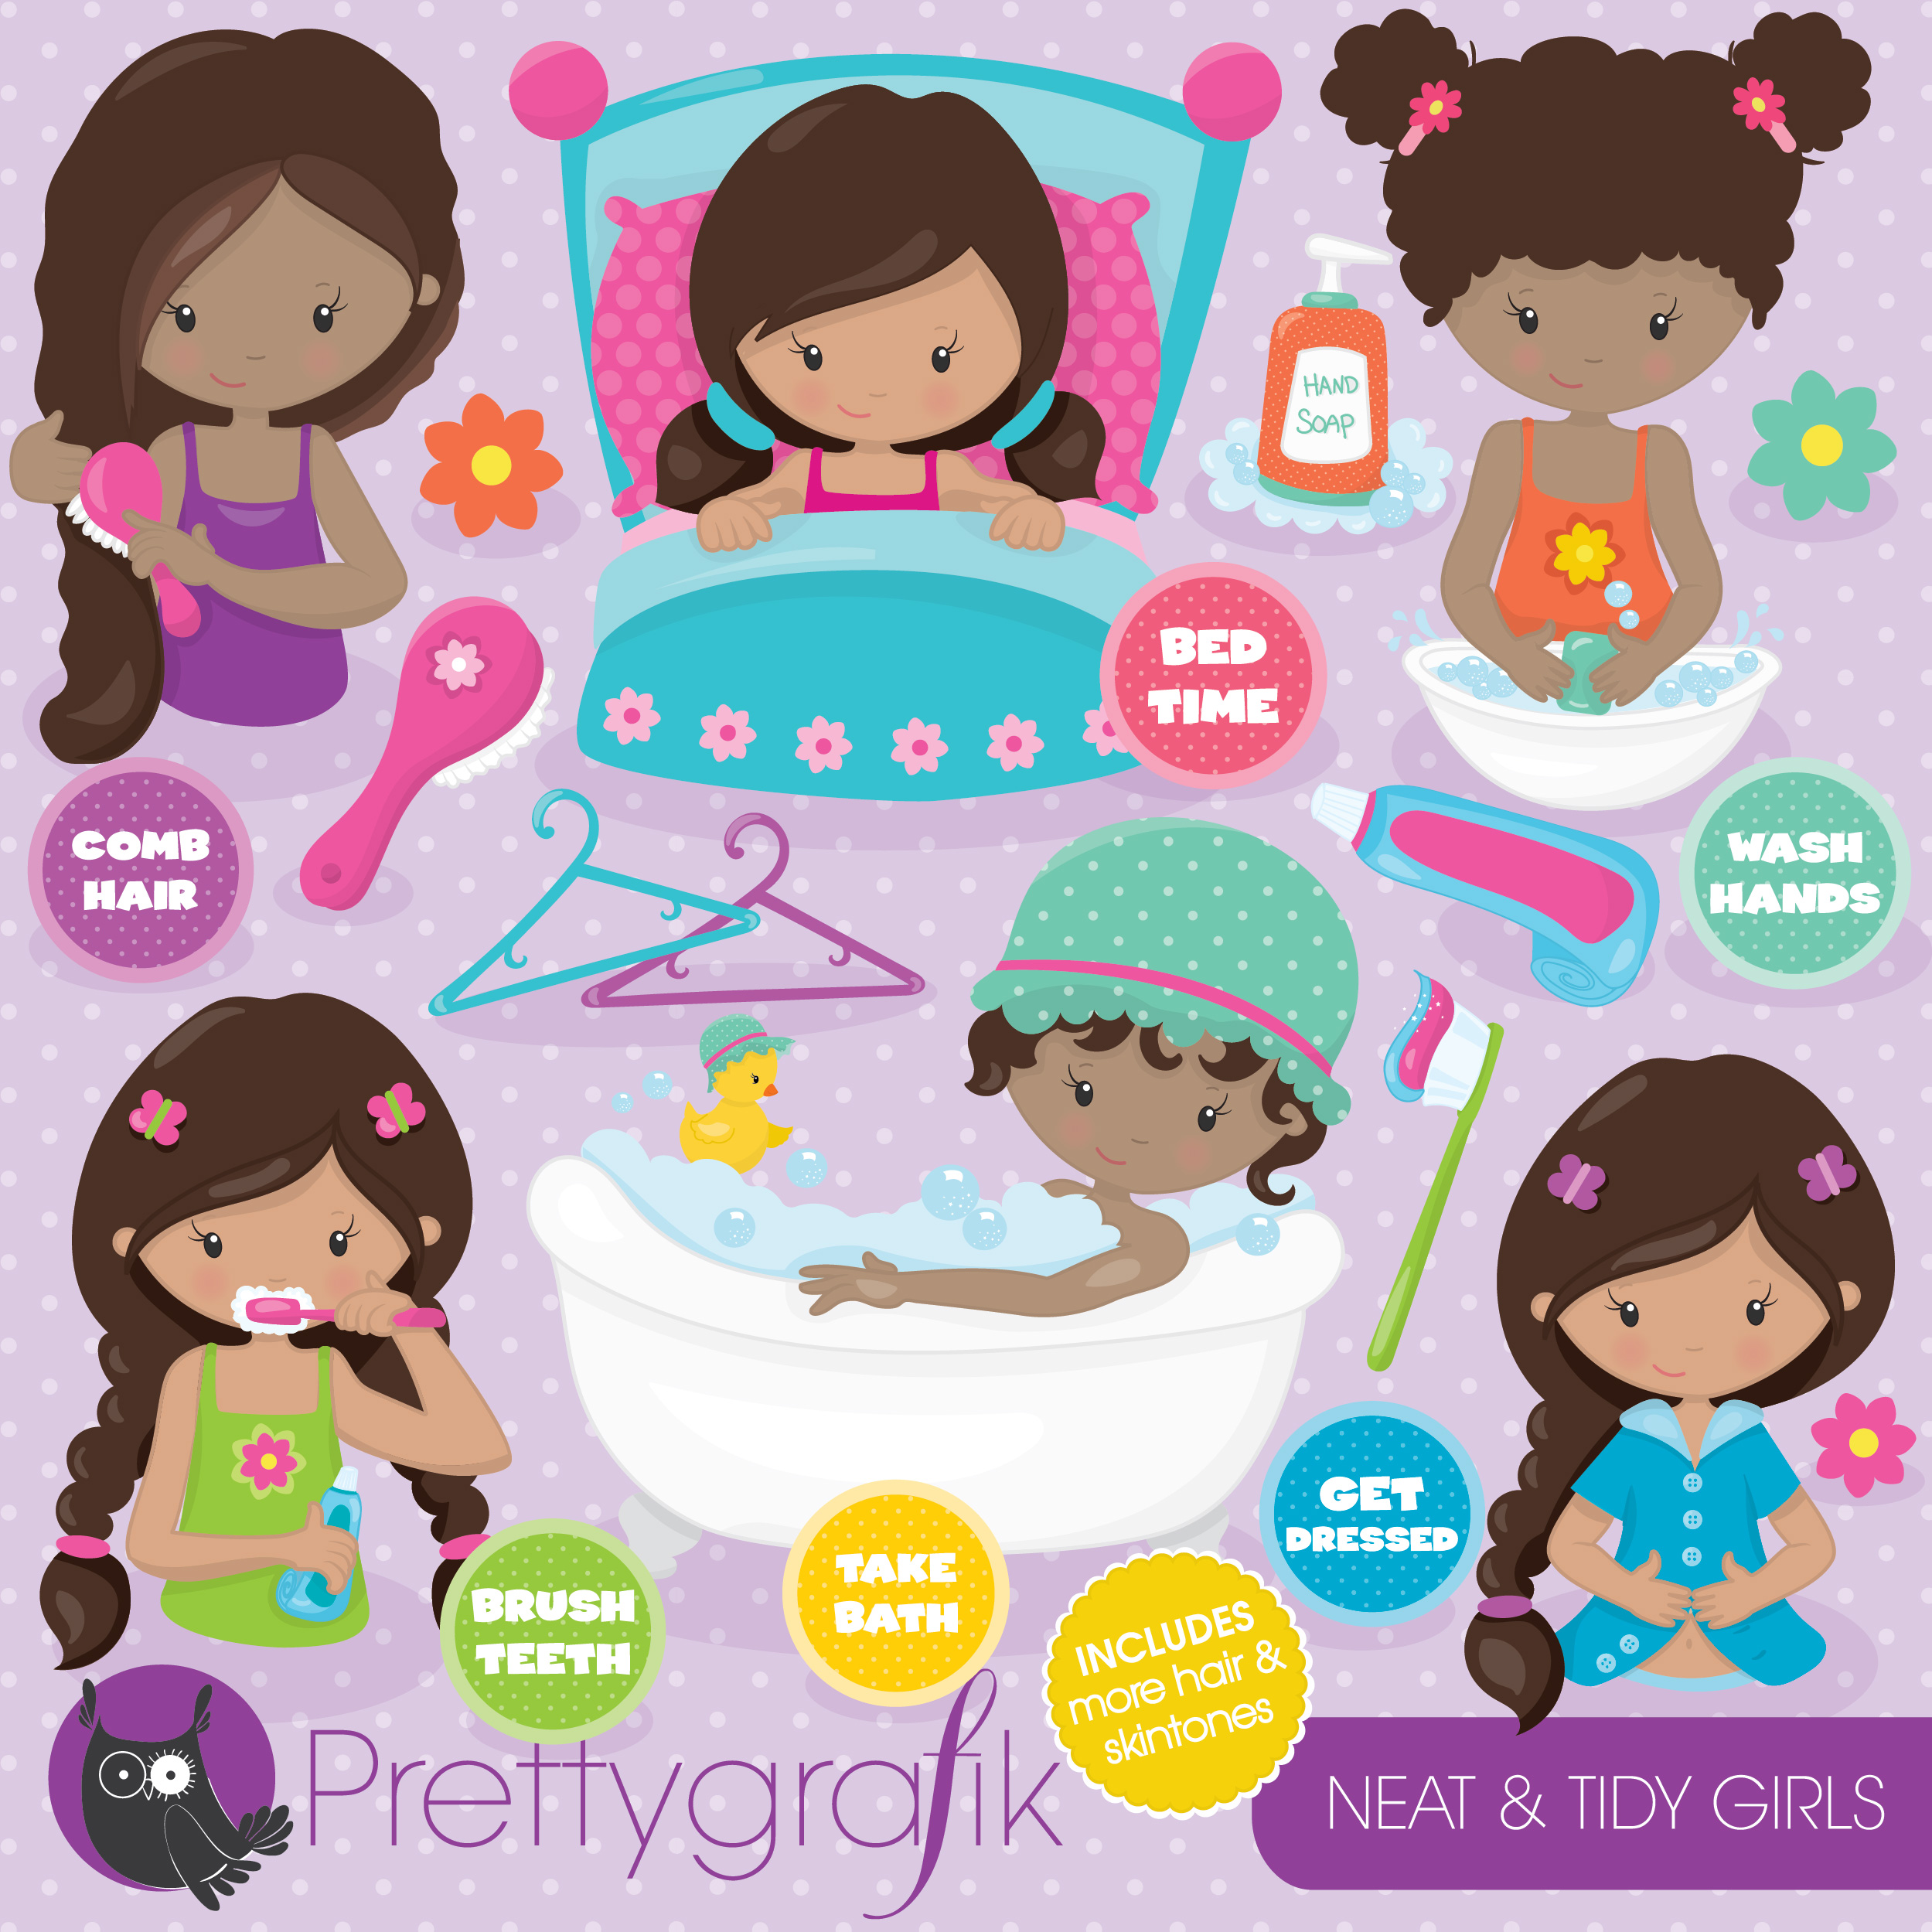 Teenage hygiene clipart png transparent download Free Hygienist Cliparts, Download Free Clip Art, Free Clip ... png transparent download